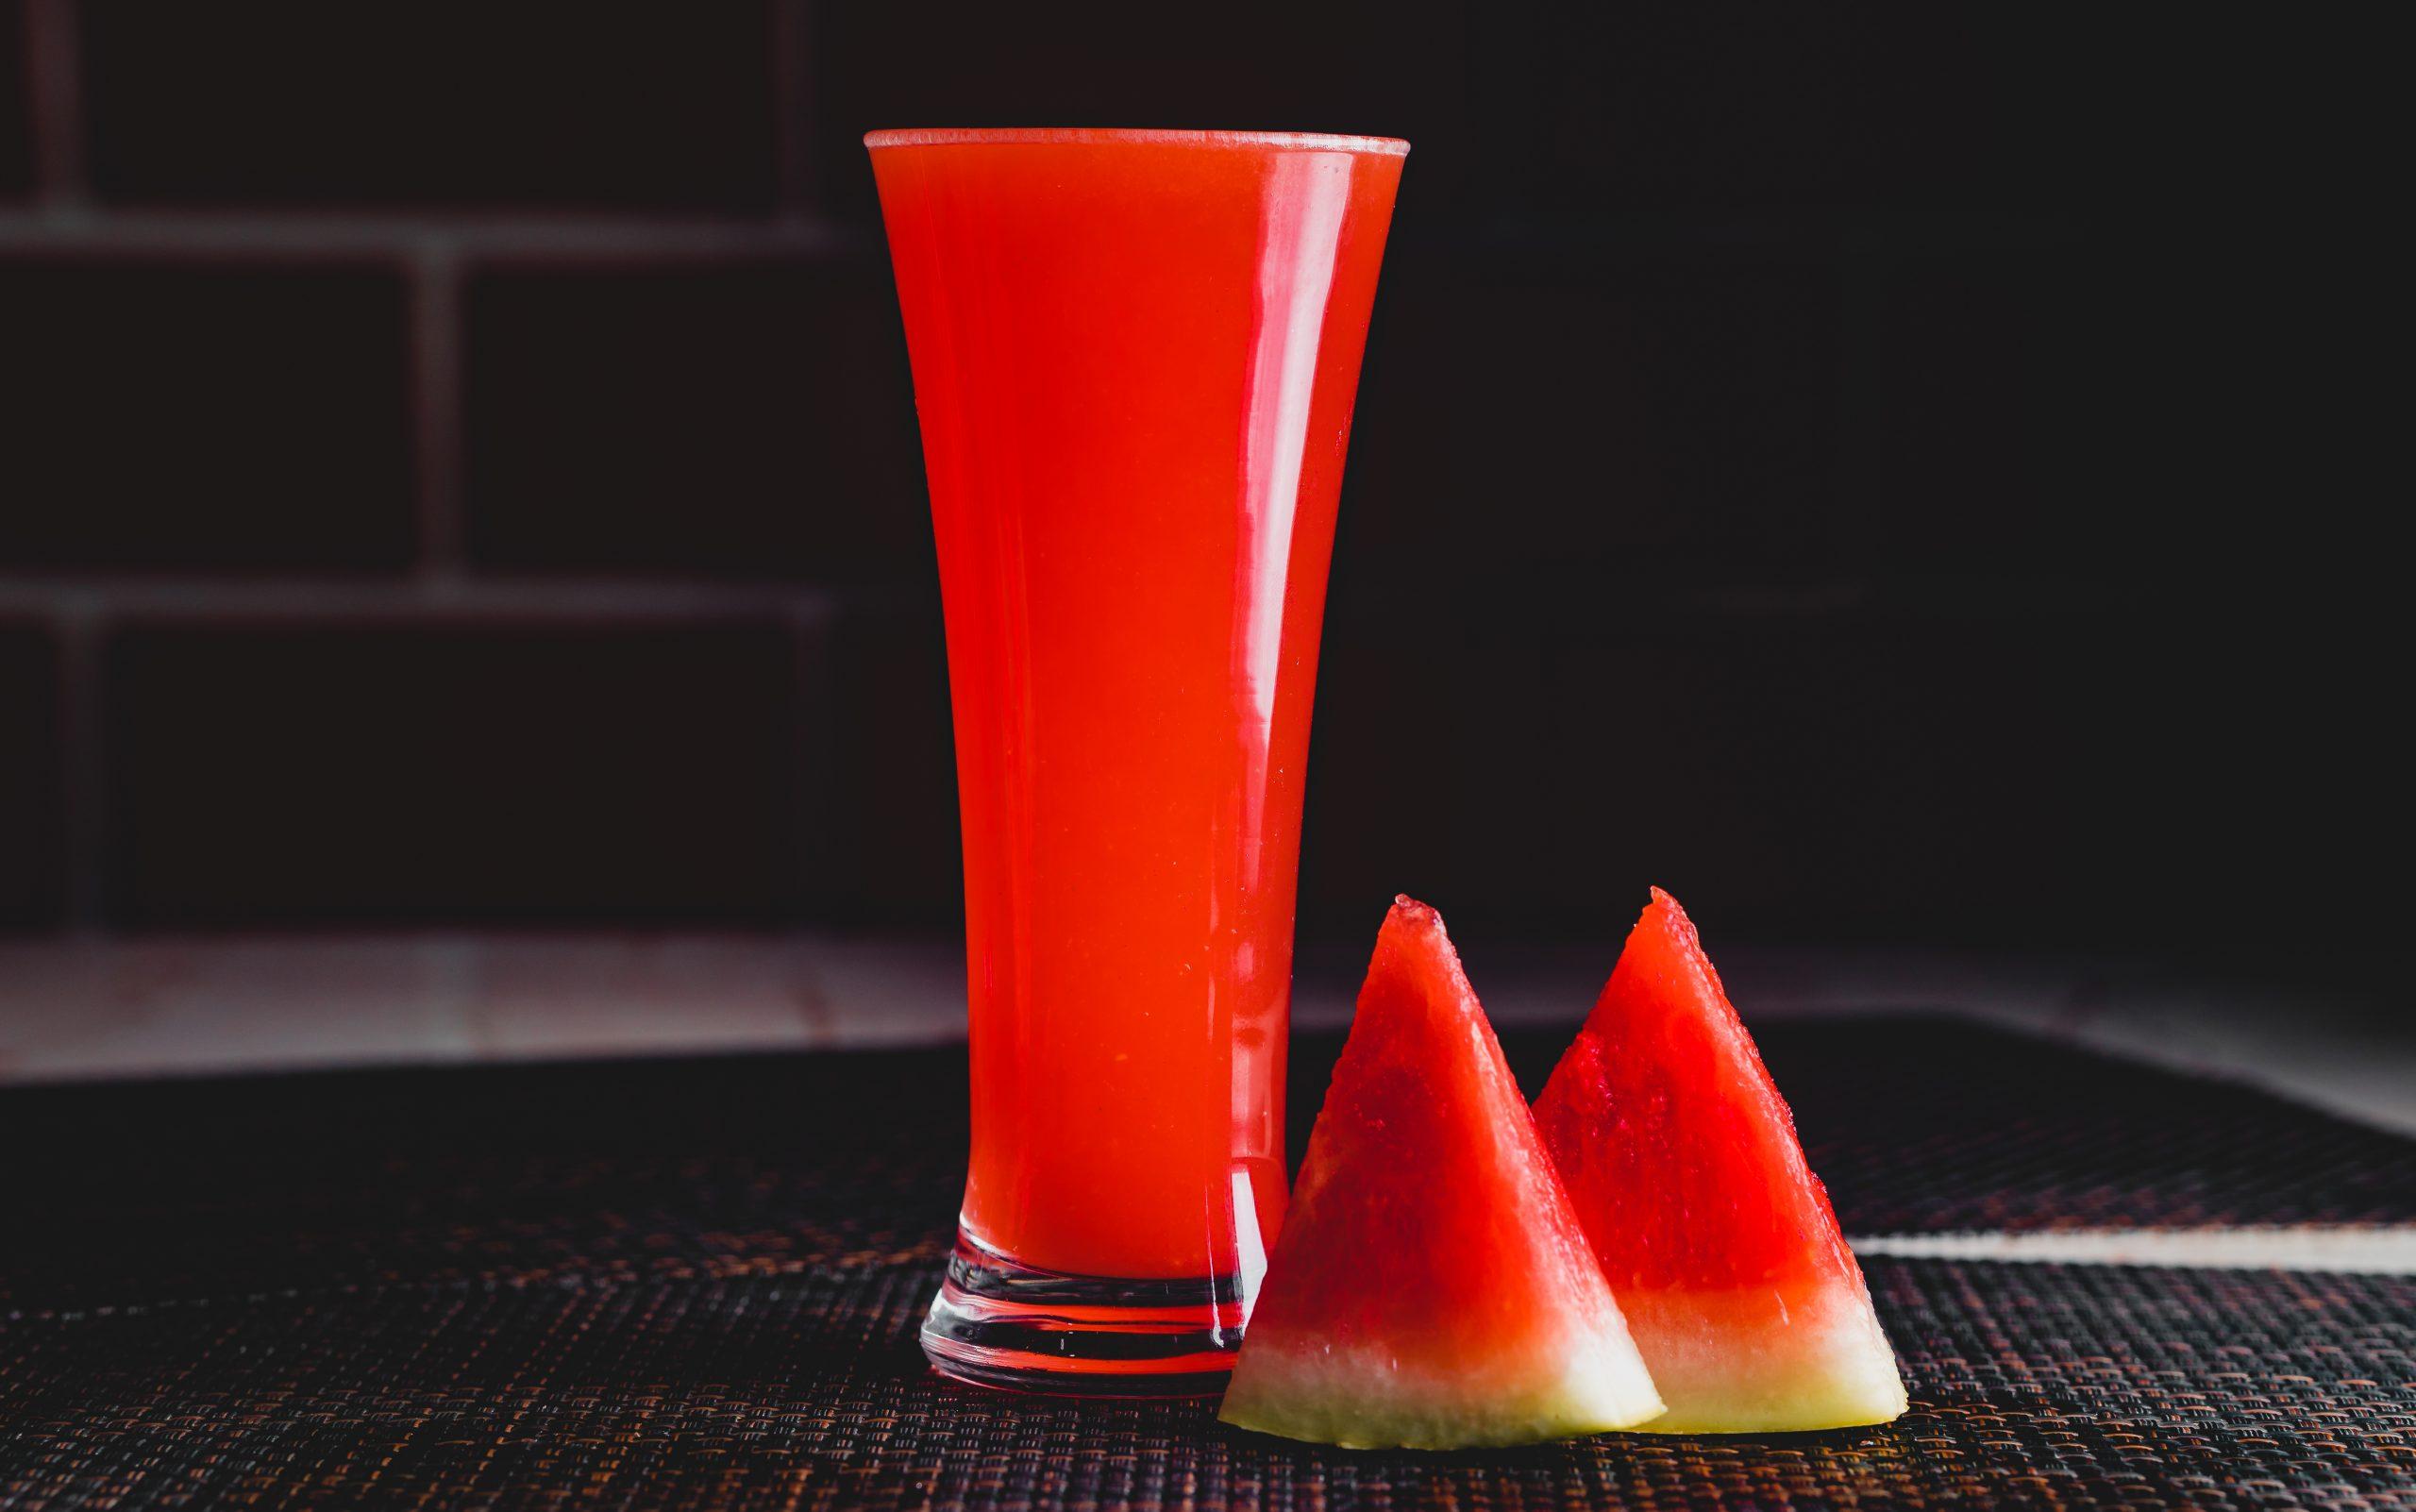 Watermelon and watermelon juice